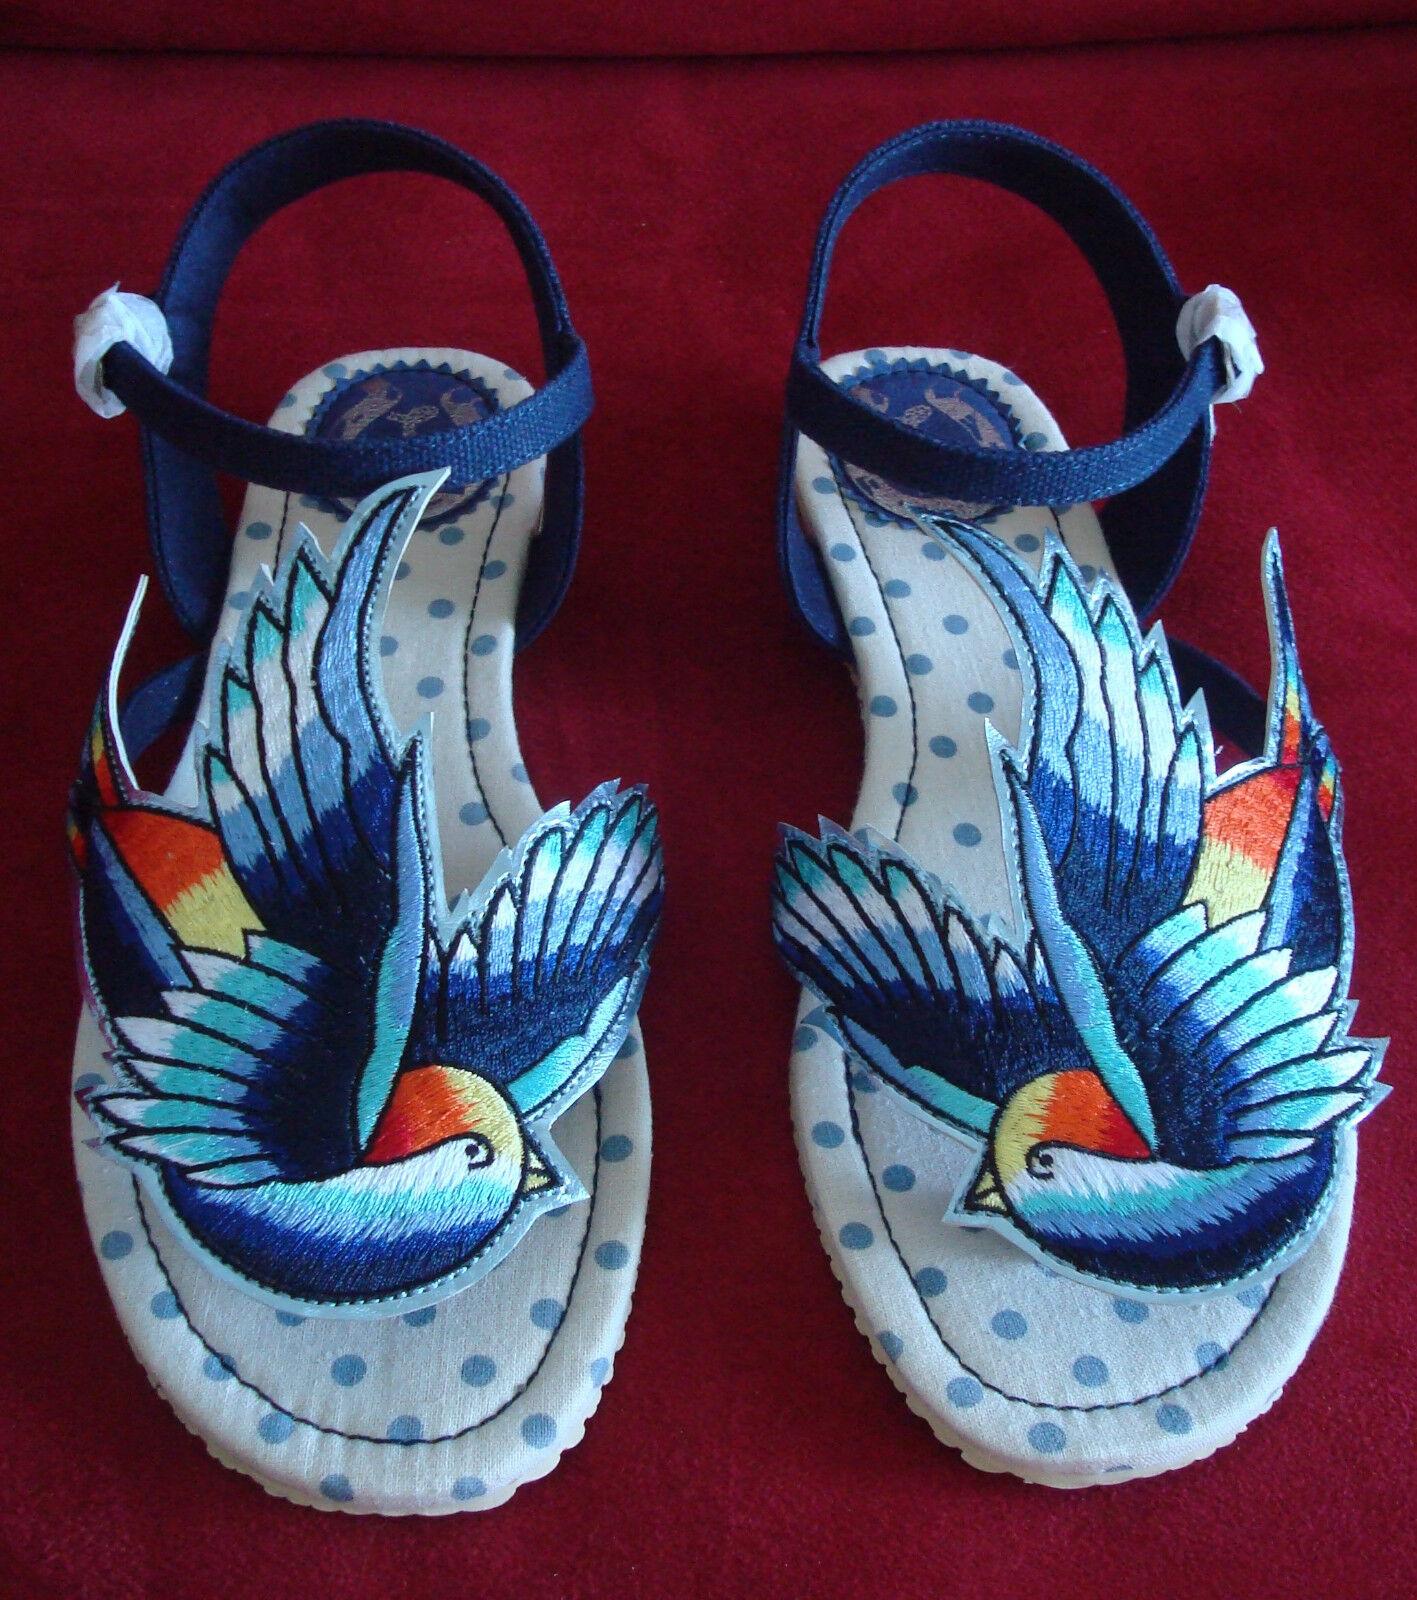 Nuevos Zapatos By Miss L Fire, azul Bird Multi, Caja Original